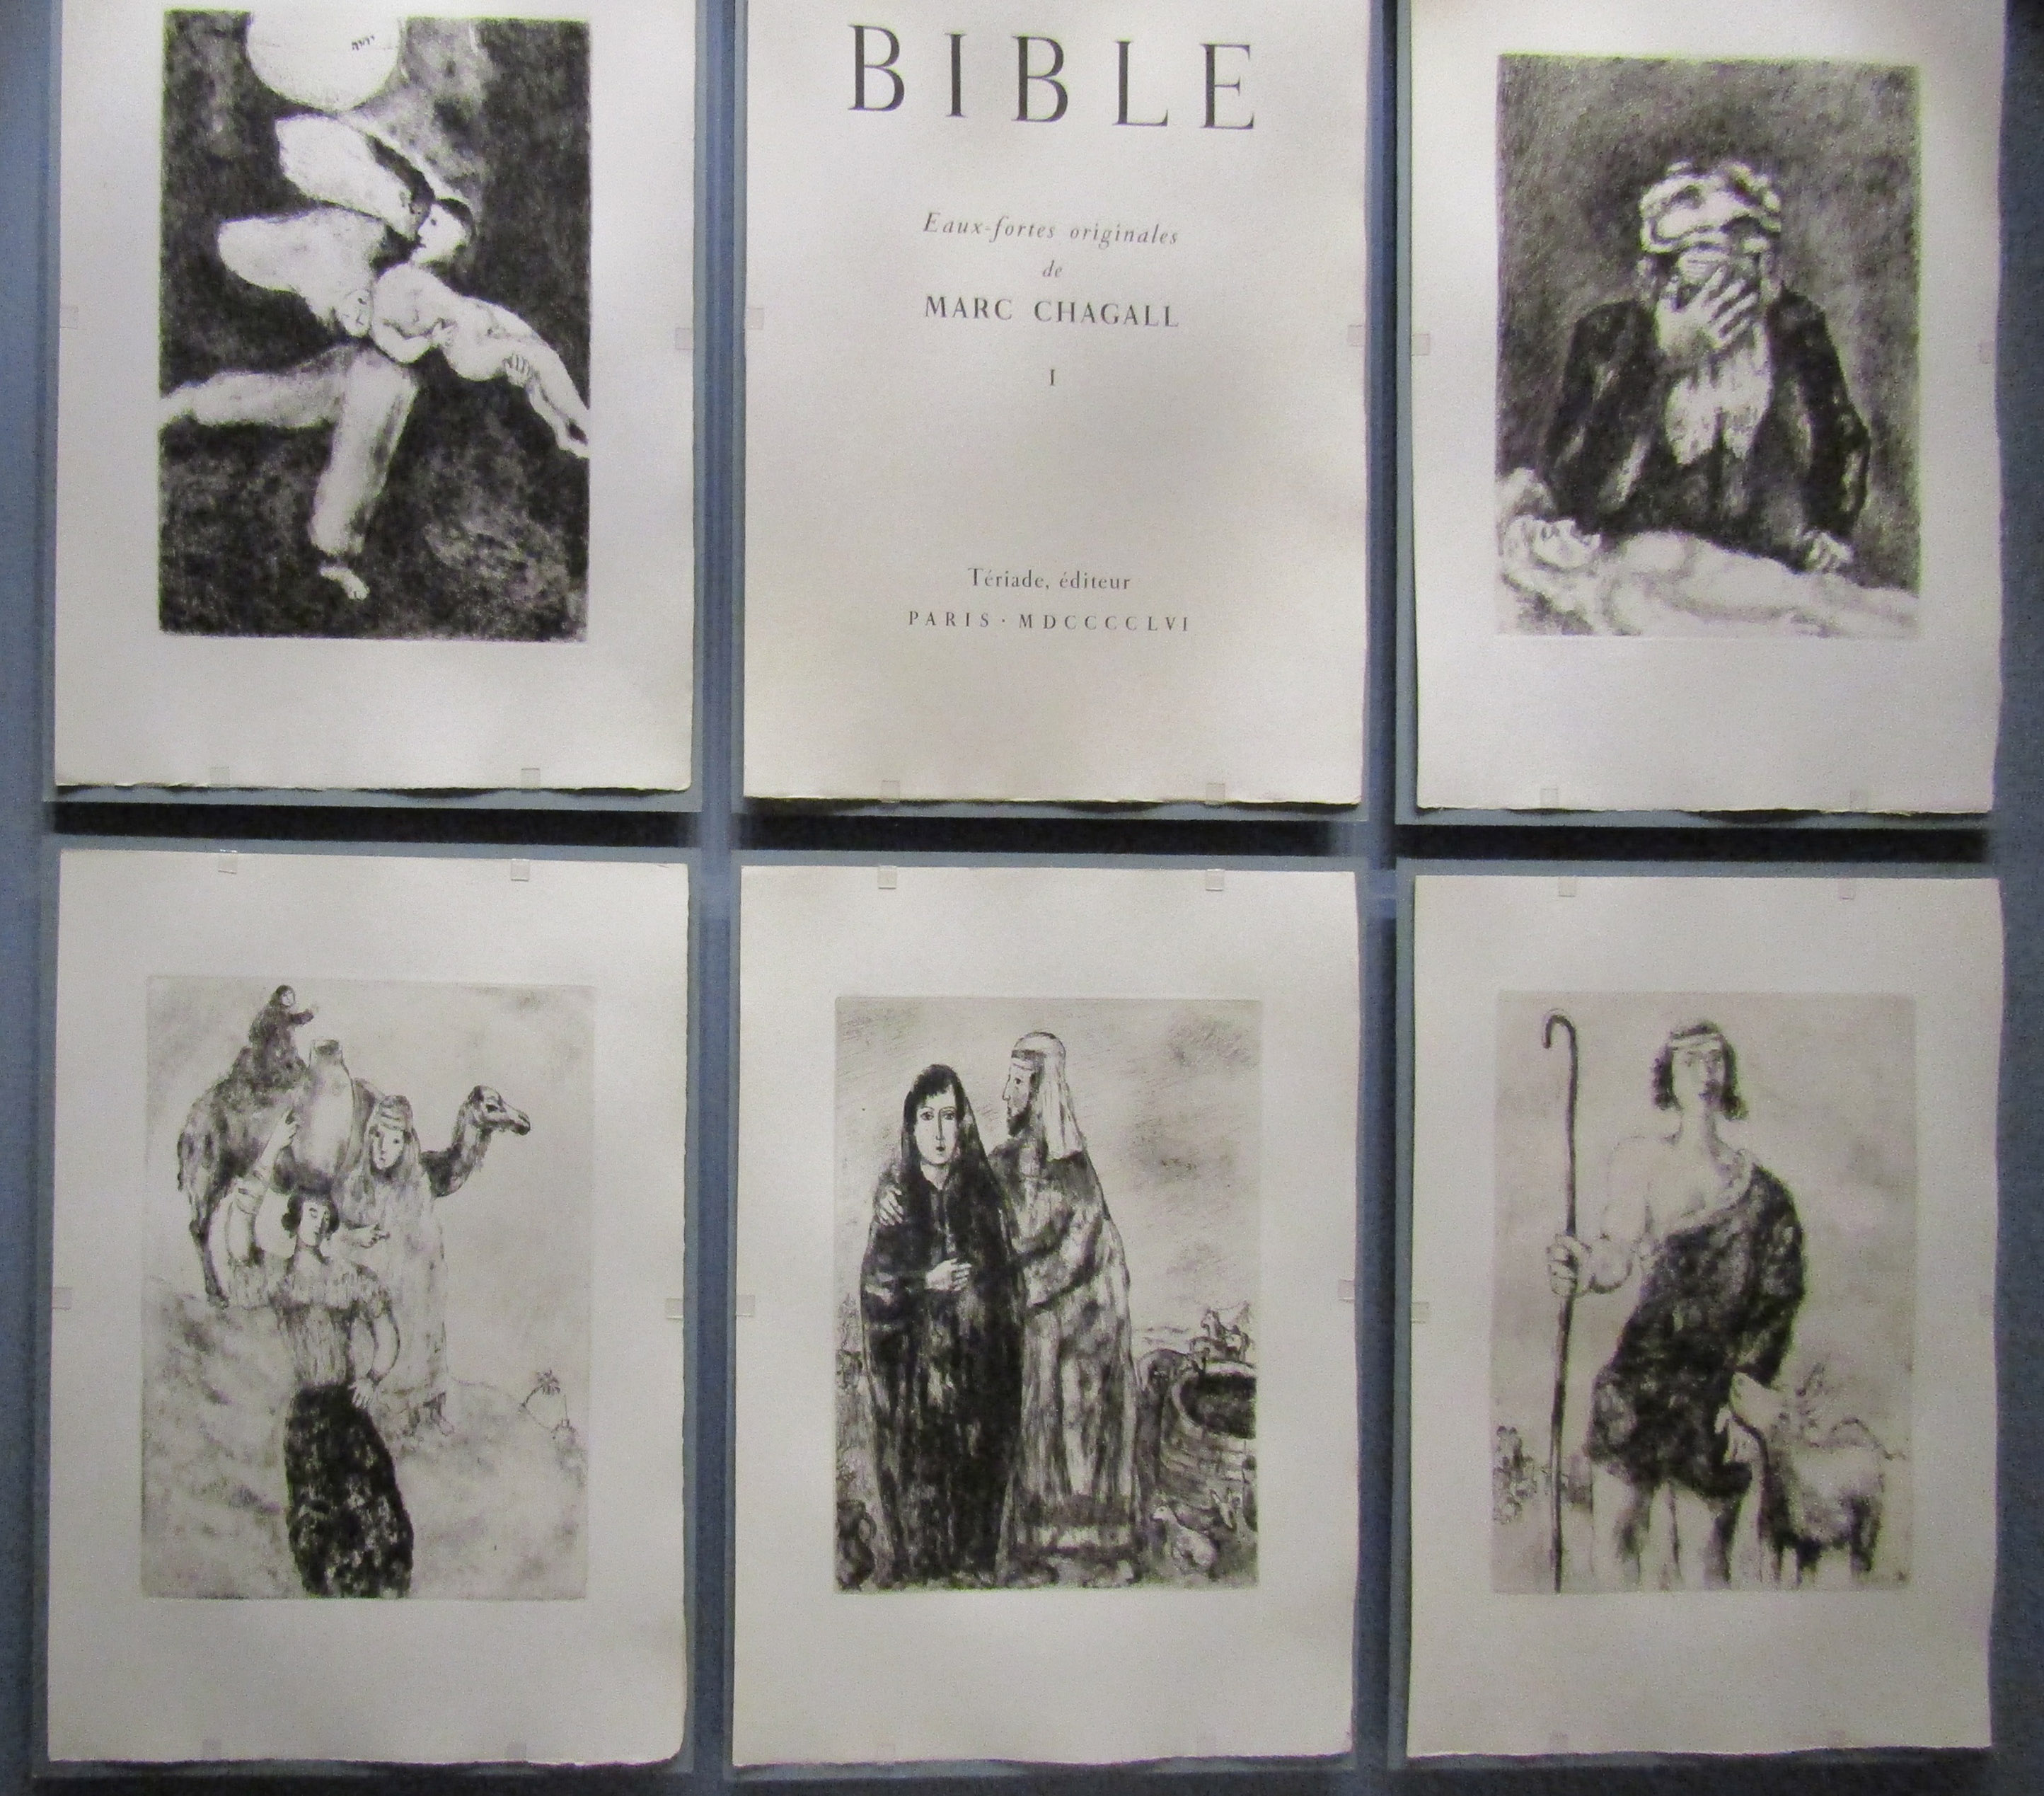 Шагал Библия 2.JPG